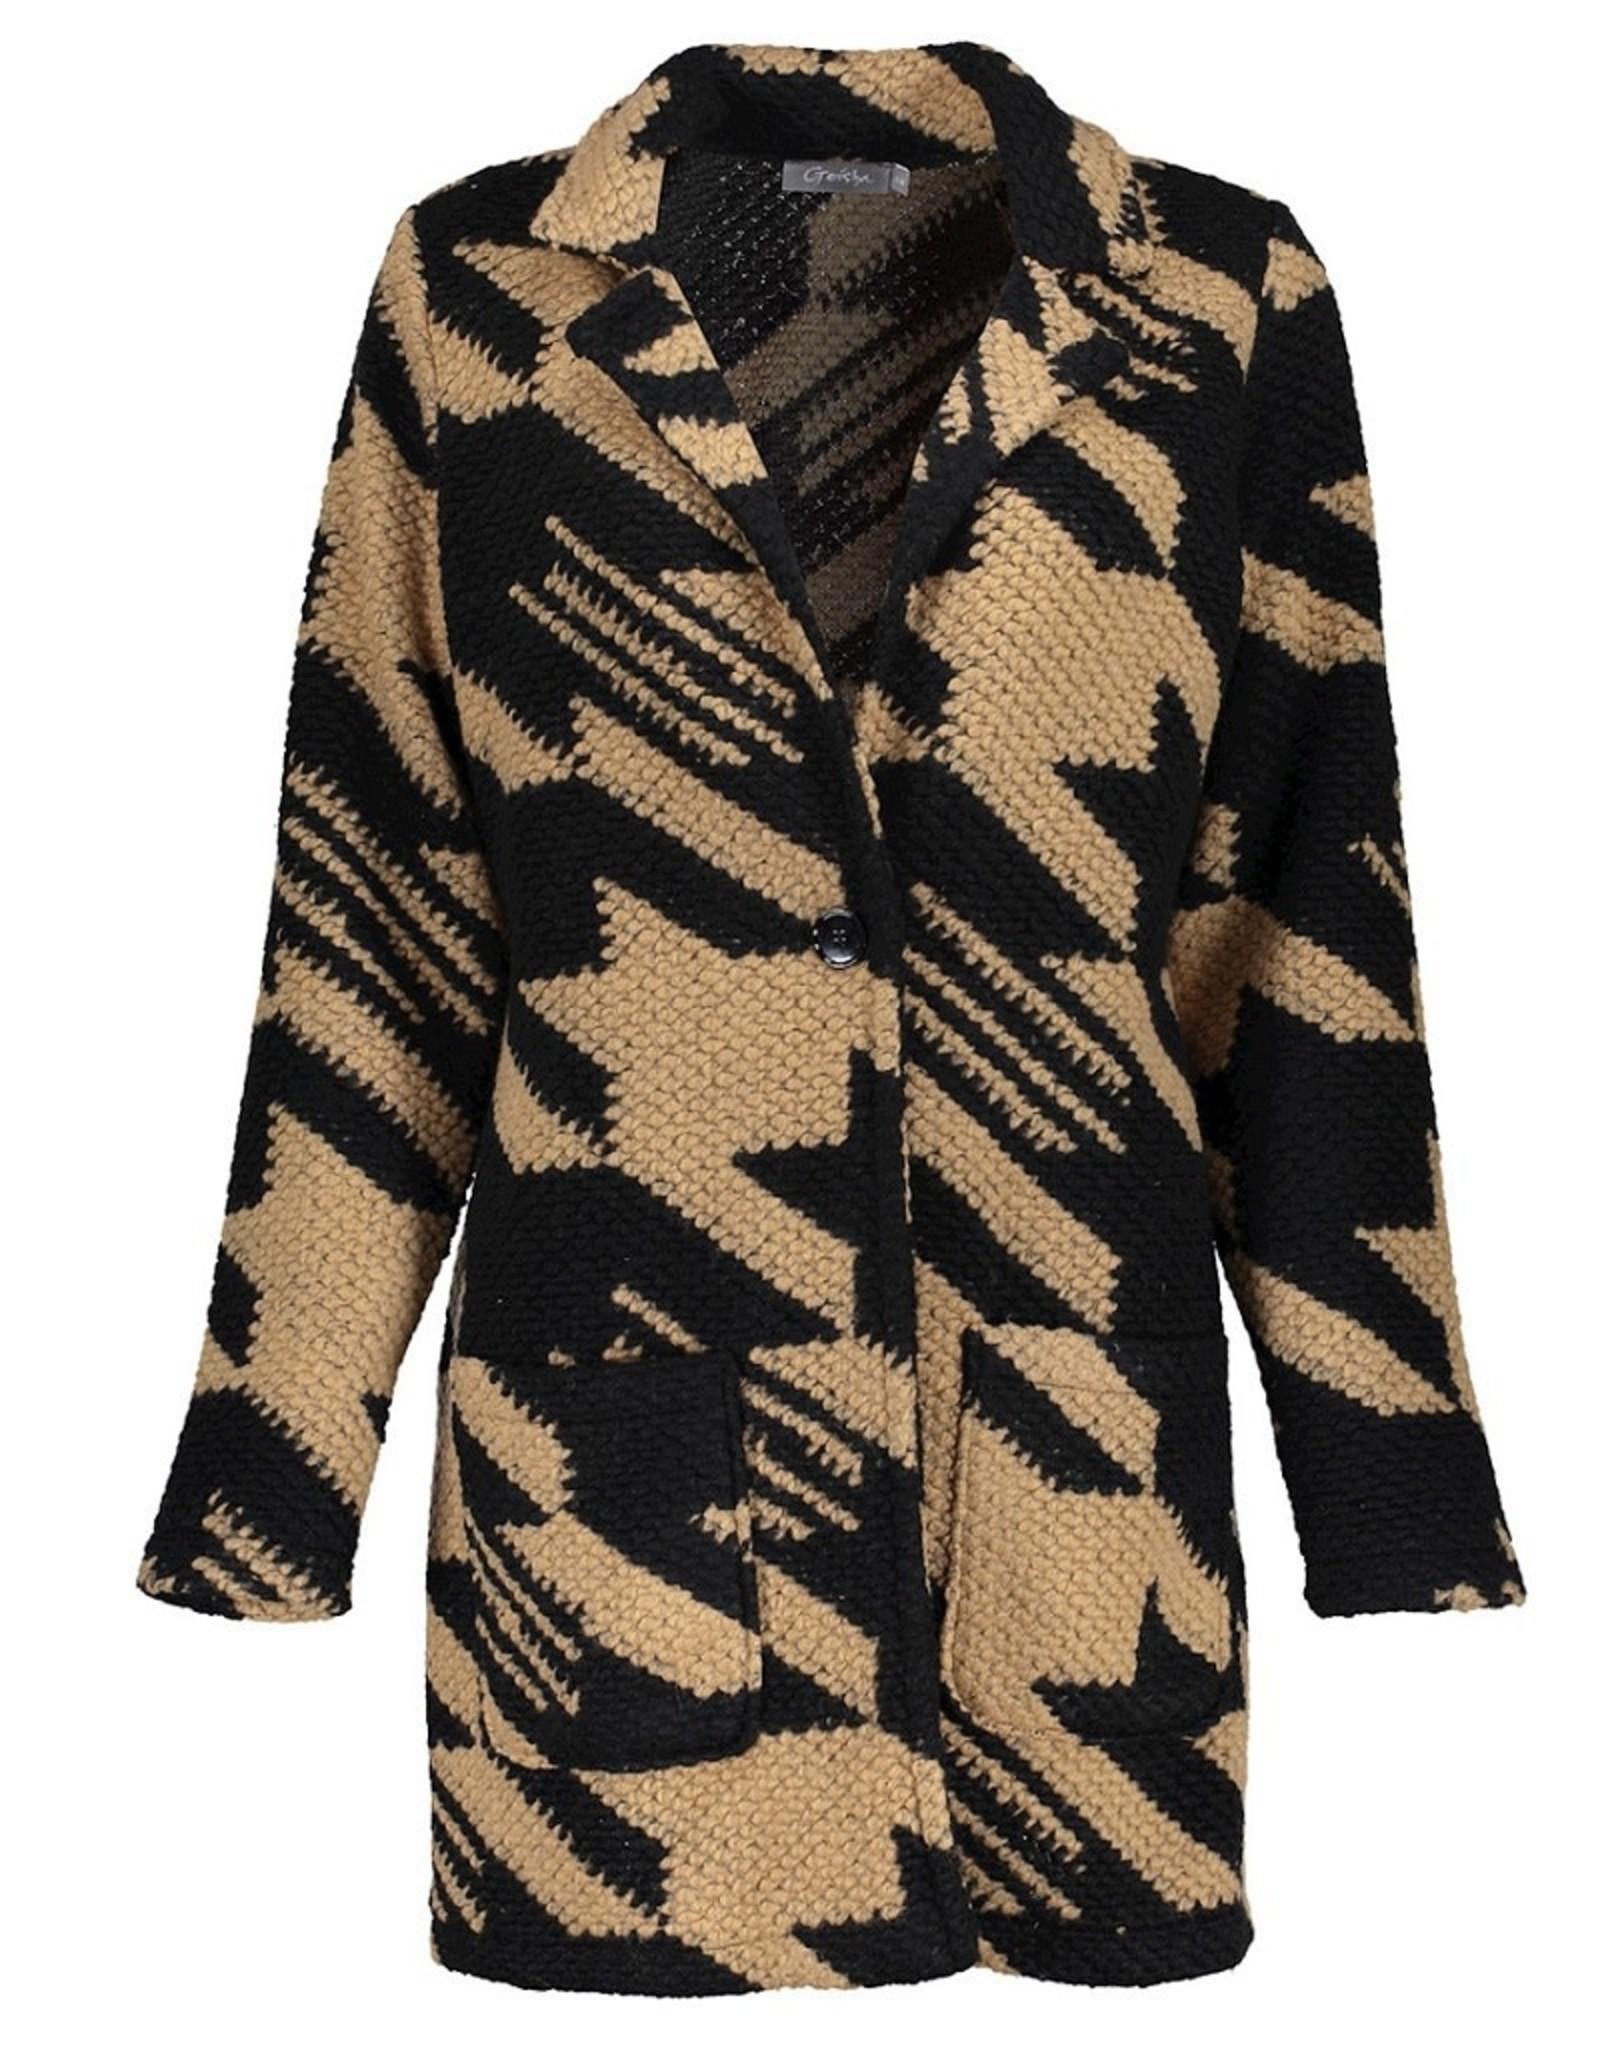 Geisha vest camel black 14588